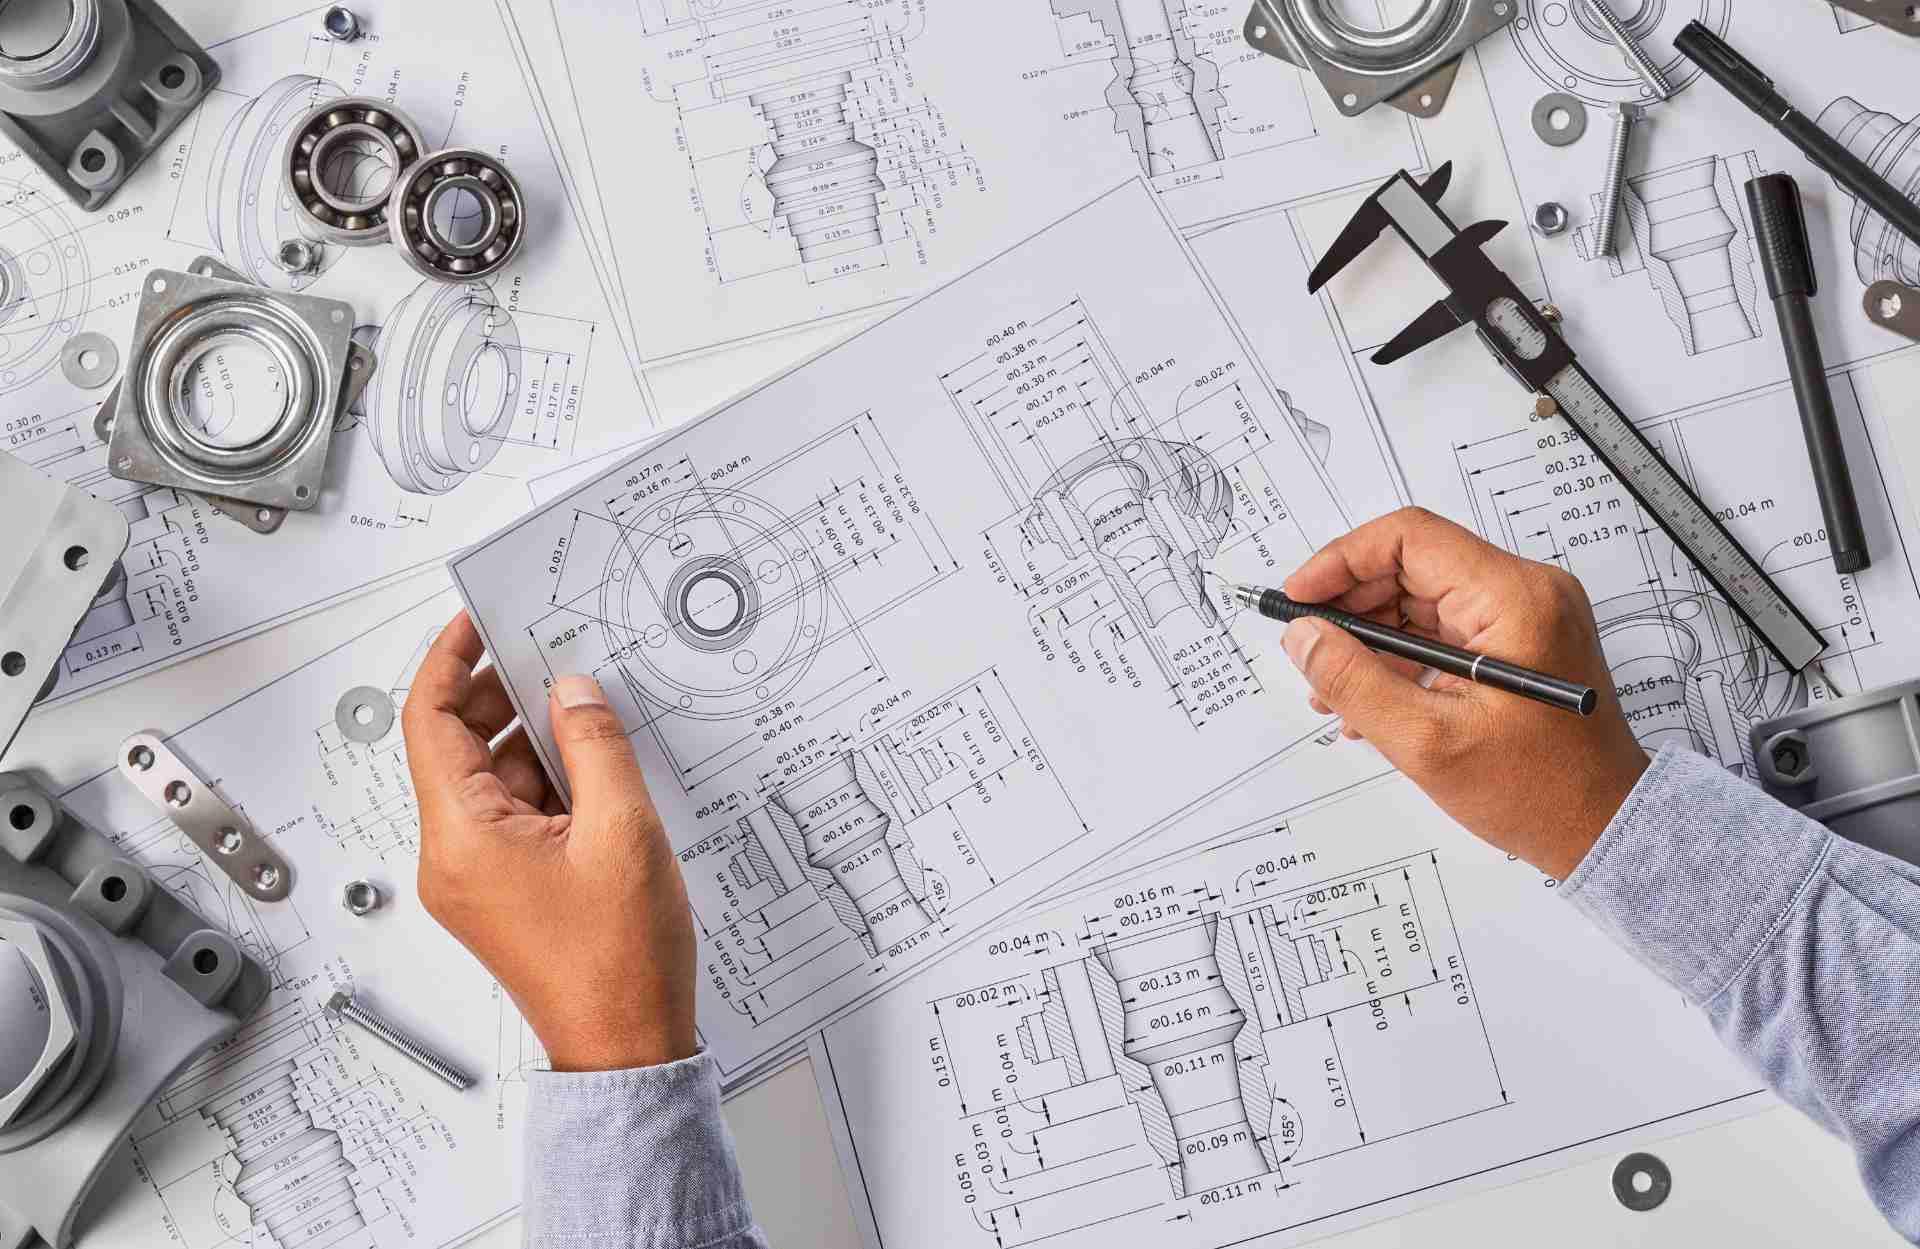 Engineer technician designing drawings mechanicalparts engineering Engine